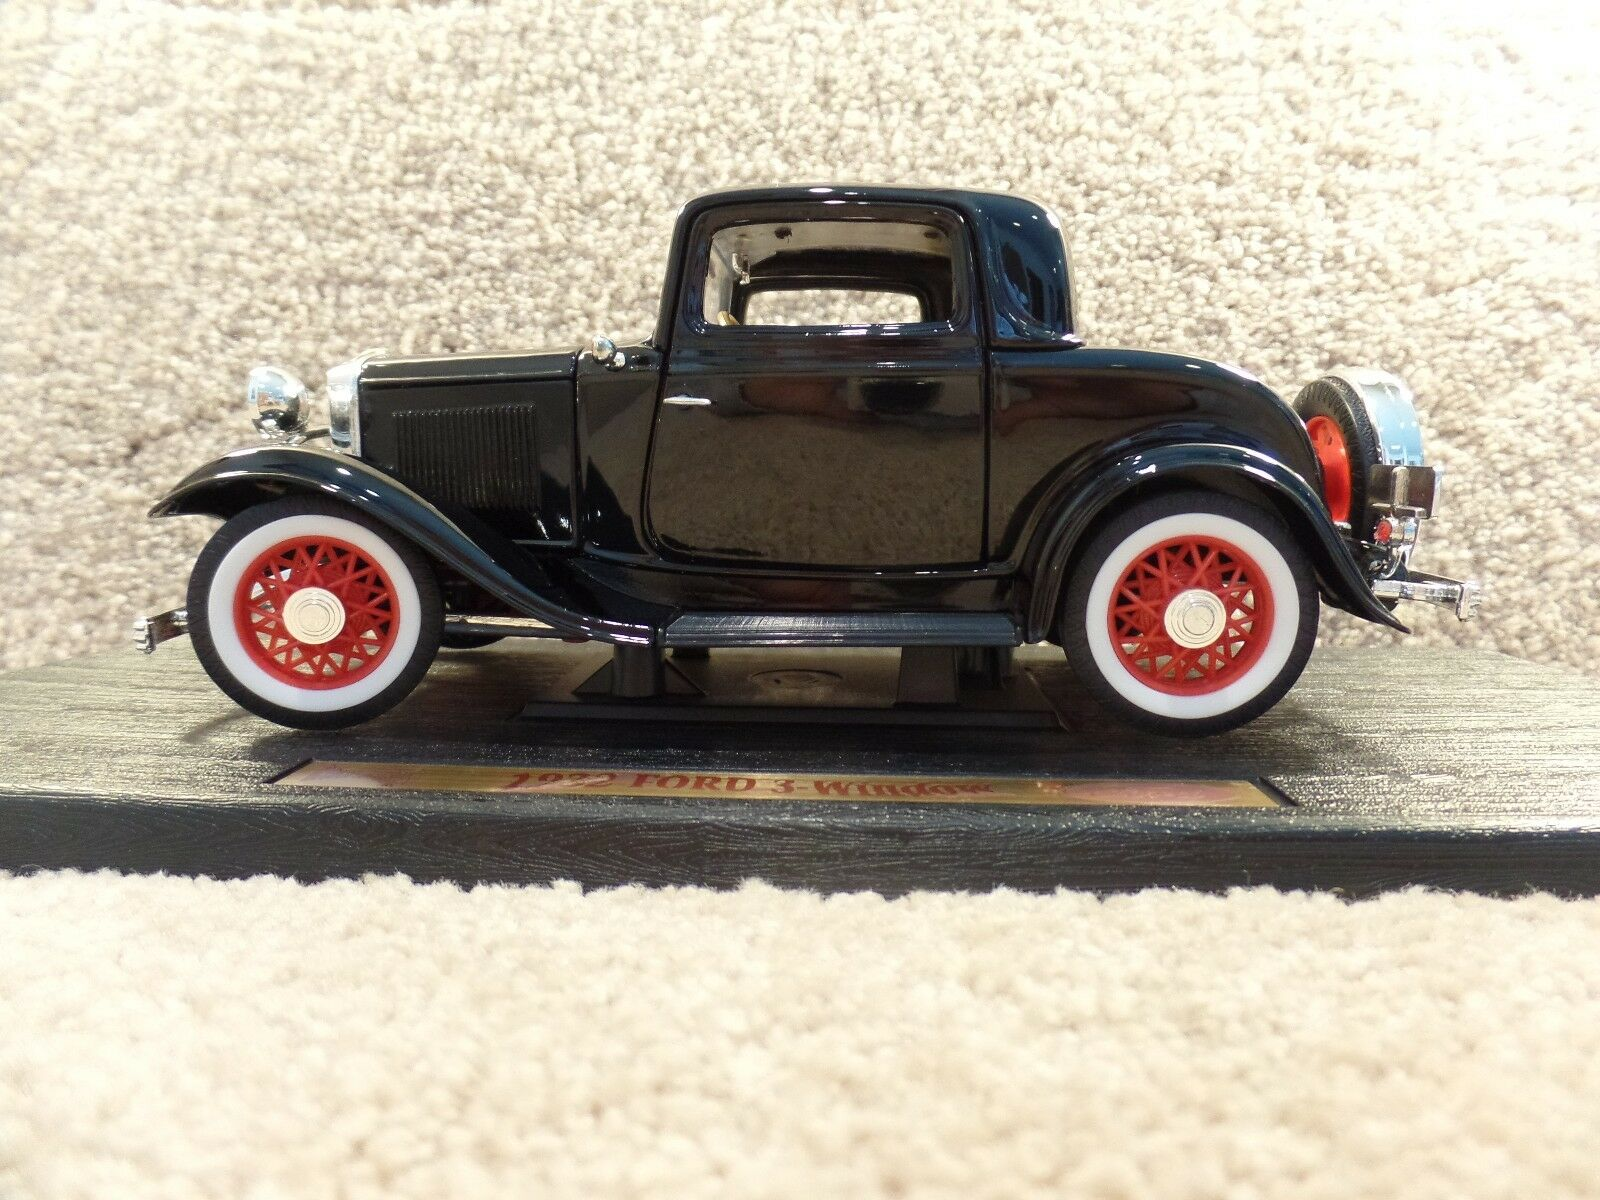 Vintage 1932 Road Legends 1 18 escala Diecast Ford 3-window 3-window 3-window Coupe Coche Negro 7859c0